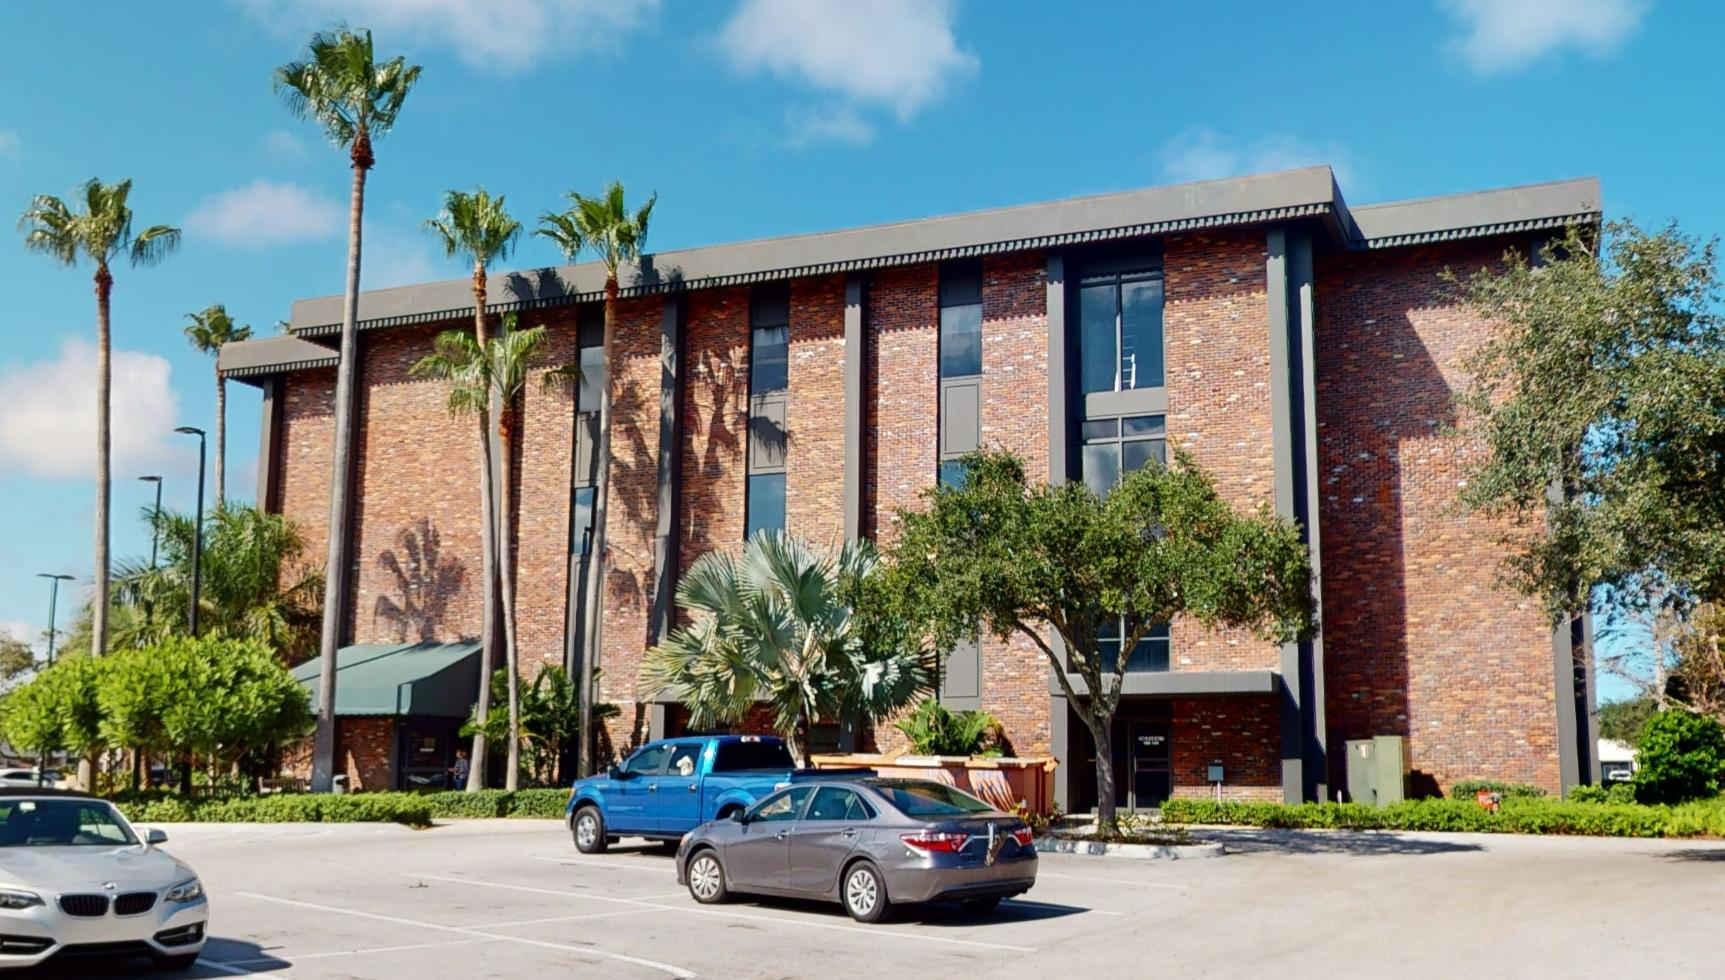 Bank of America financial center with drive-thru ATM | 601 21st St, Vero Beach, FL 32960